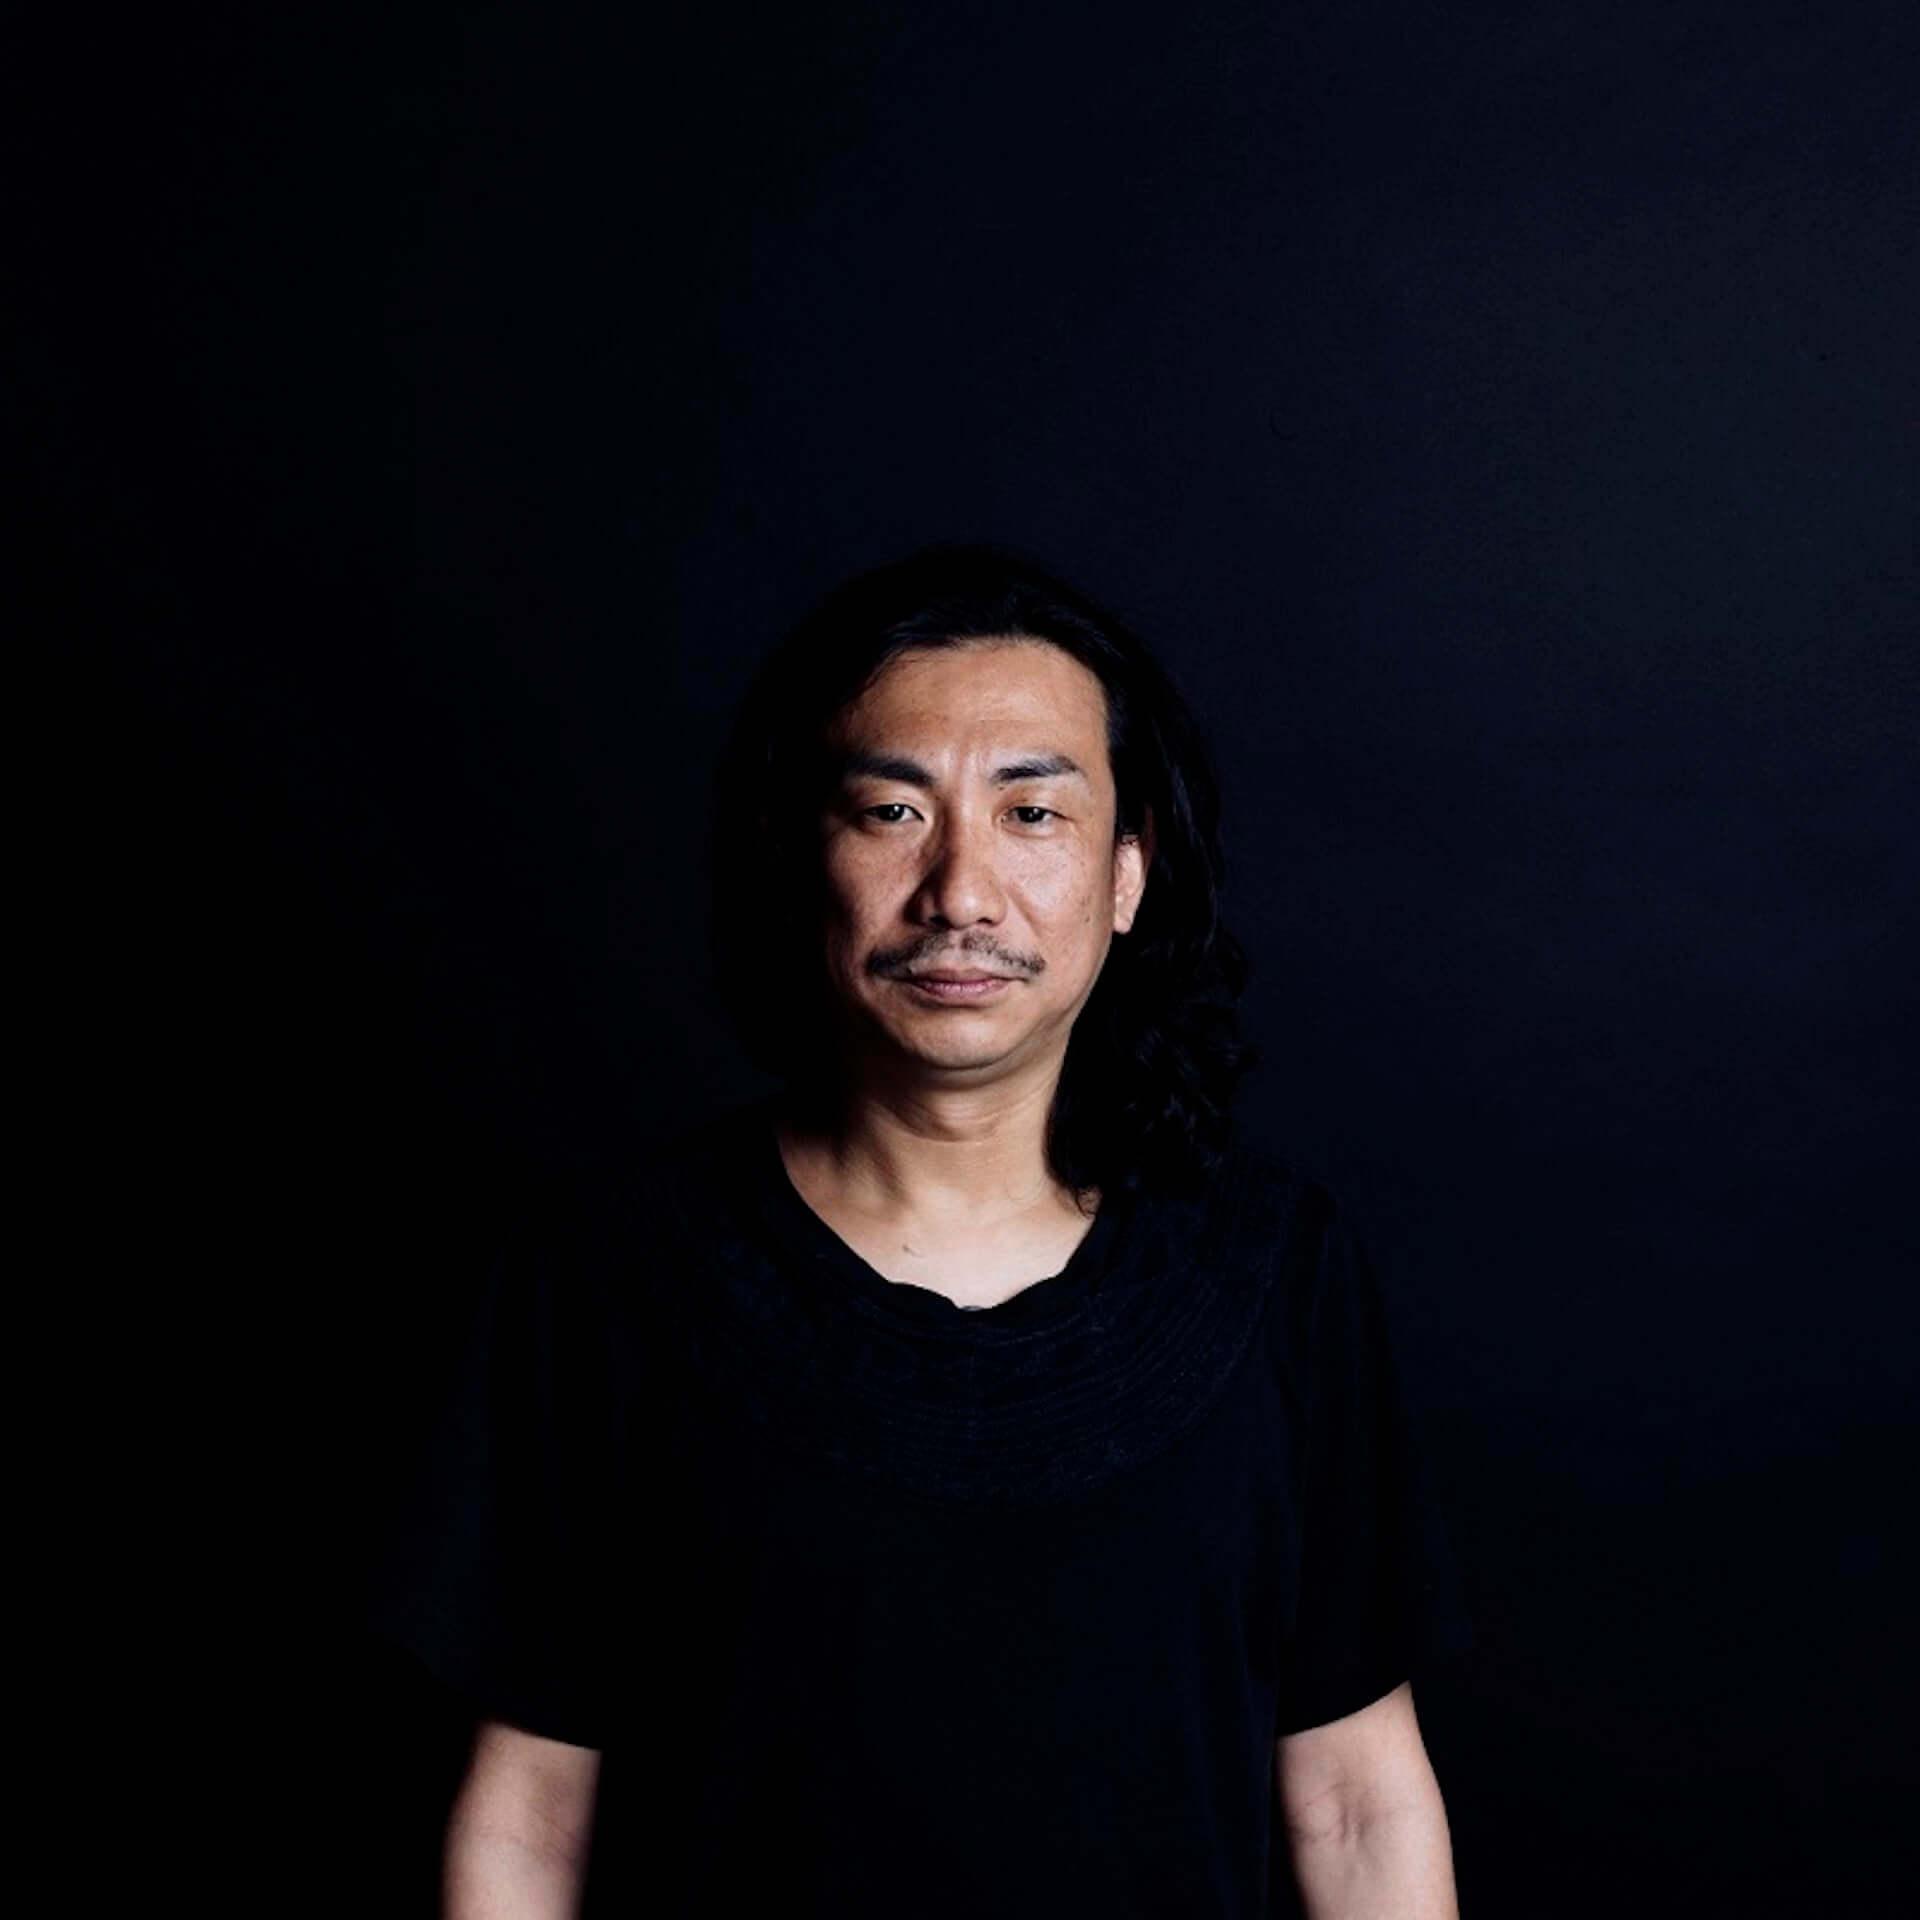 Pioneer DJ『CDJ-3000』のローンチパーティーが渋谷Contactにて明日開催!DJ Nobu、Gonno、SEKITOVA、okadadaらが出演 music201029_contact-cdj3000_9-1920x1920